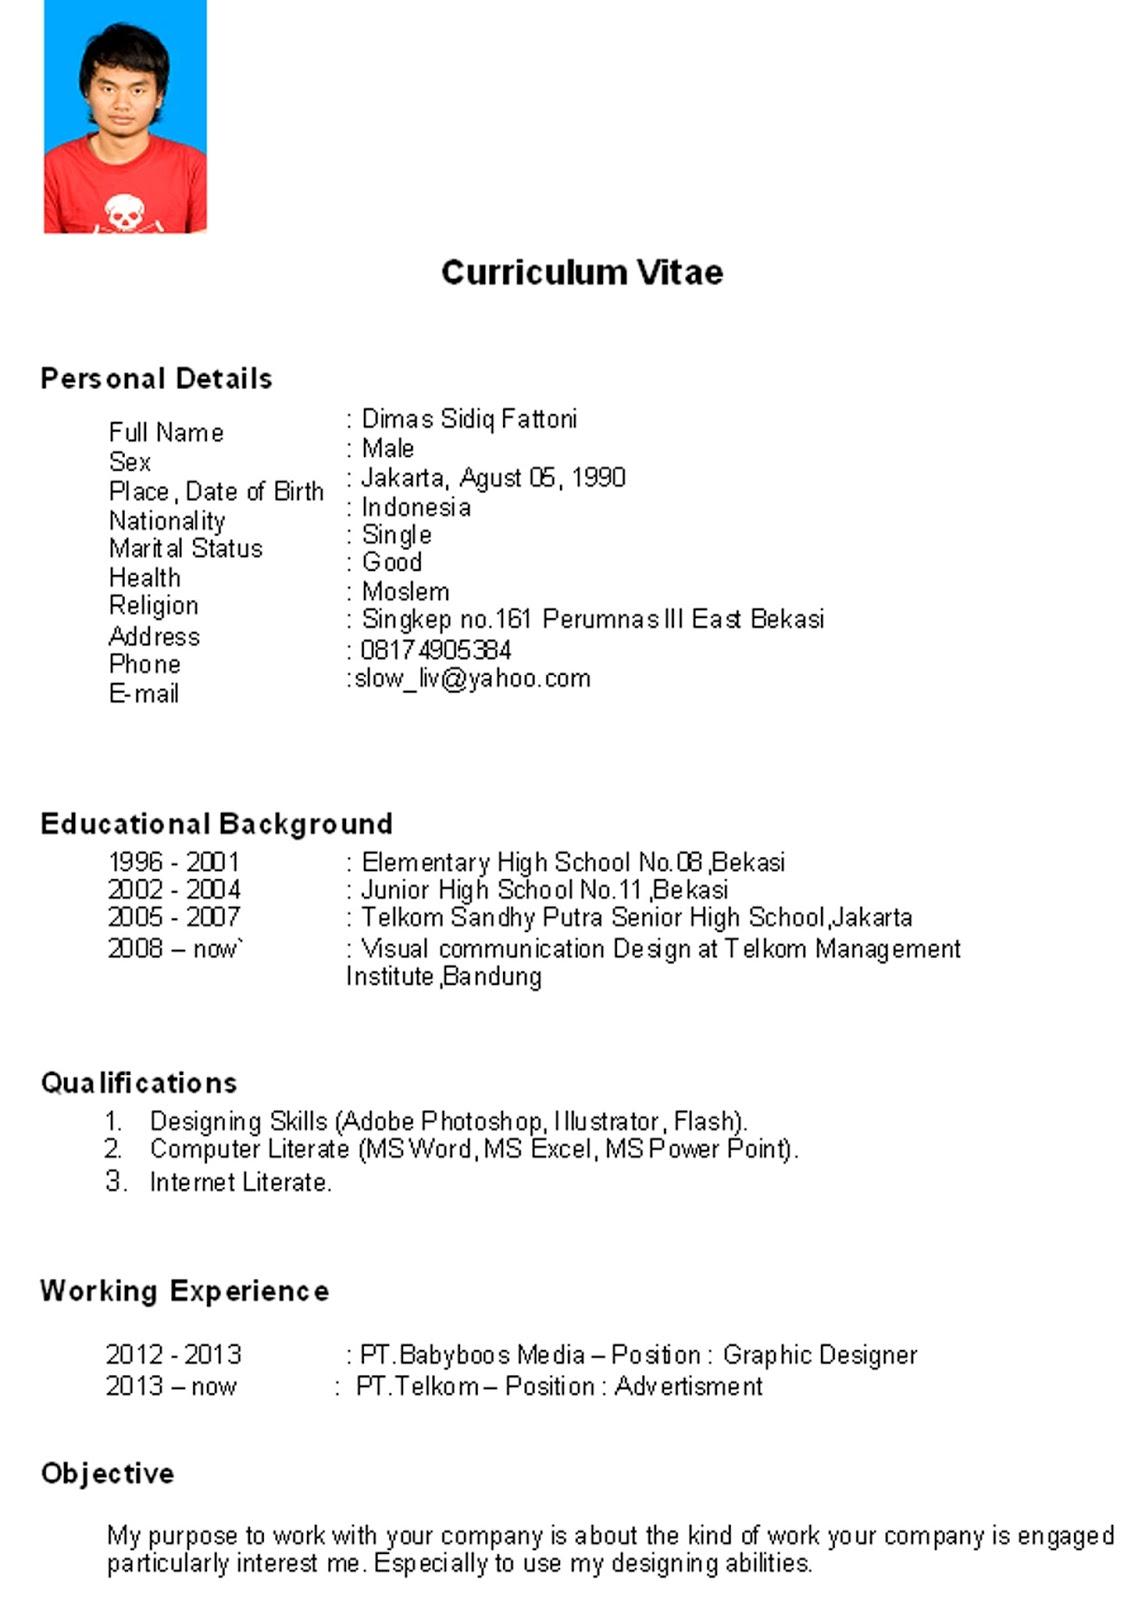 contoh curriculum vitae doc, contoh curriculum vitae fresh graduate, contoh curriculum vitae pdf, contoh cv lamaran kerja yang baik dan benar, download contoh cv, contoh cv bahasa inggris, contoh cv lamaran kerja fresh graduate, contoh cv lamaran kerja pdf  ben-jobs.blogspot.com